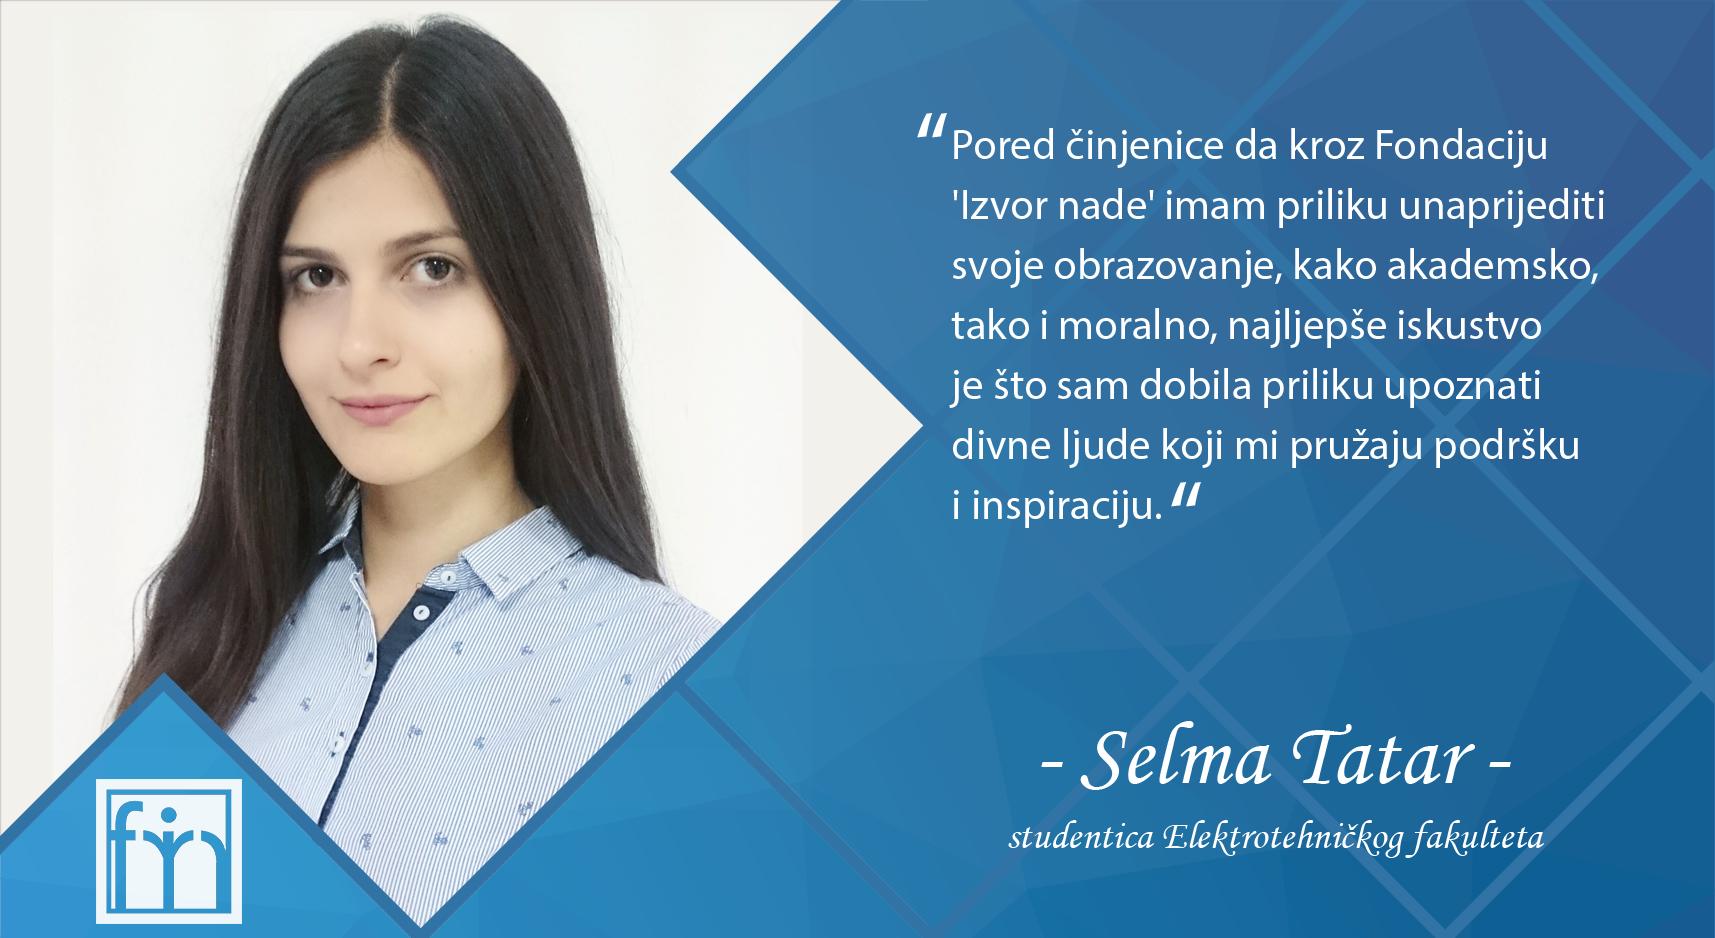 Selma_Tatar_Izvor_nade